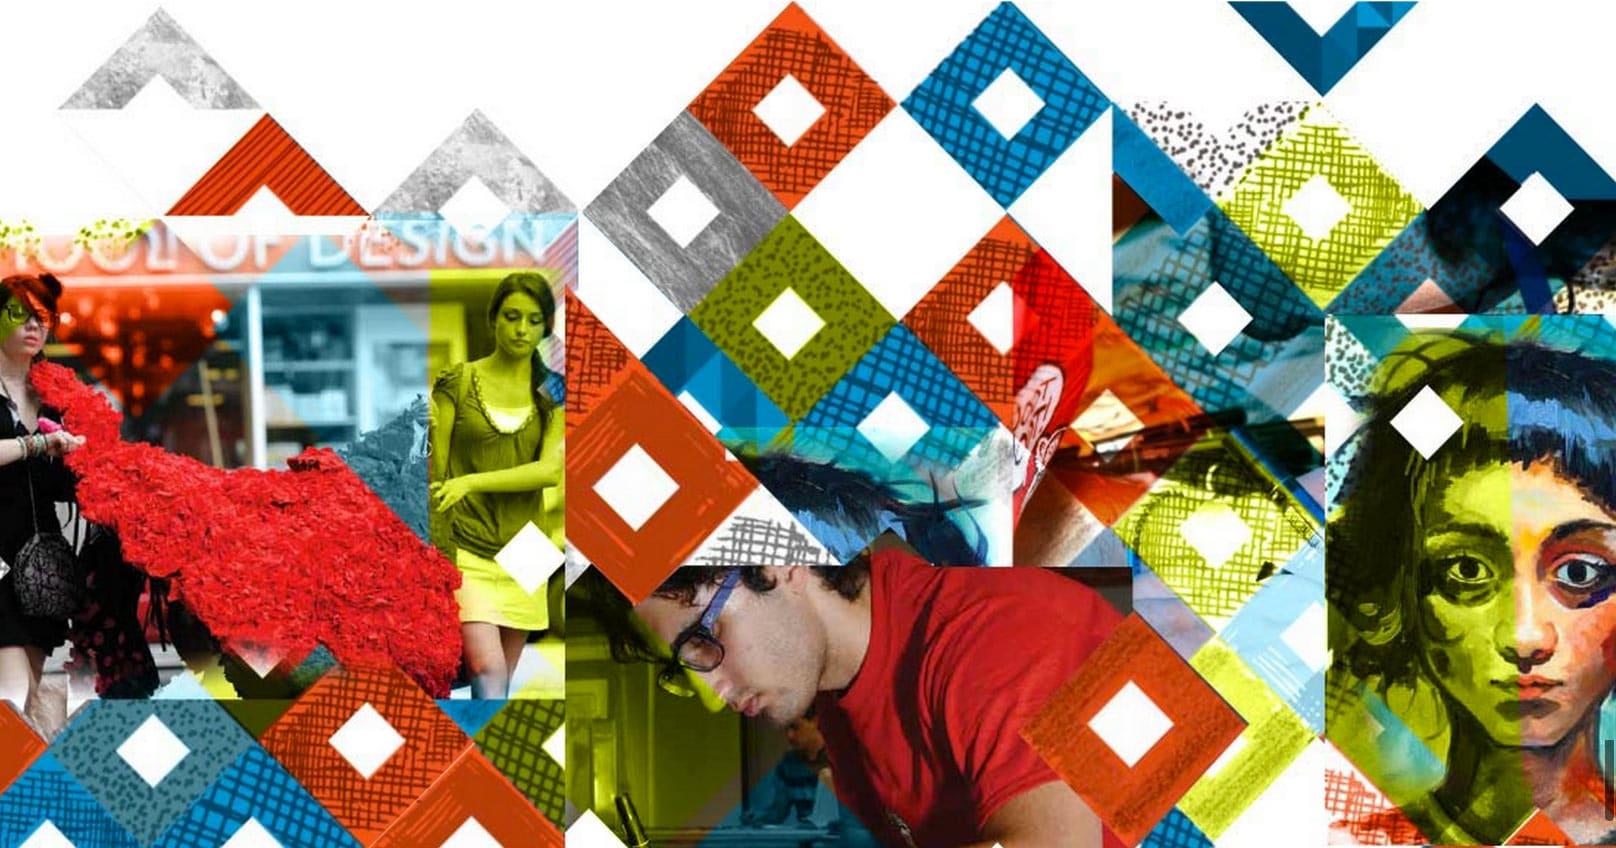 responsive web design and development for RISD in Providence, Rhode Island (RI)